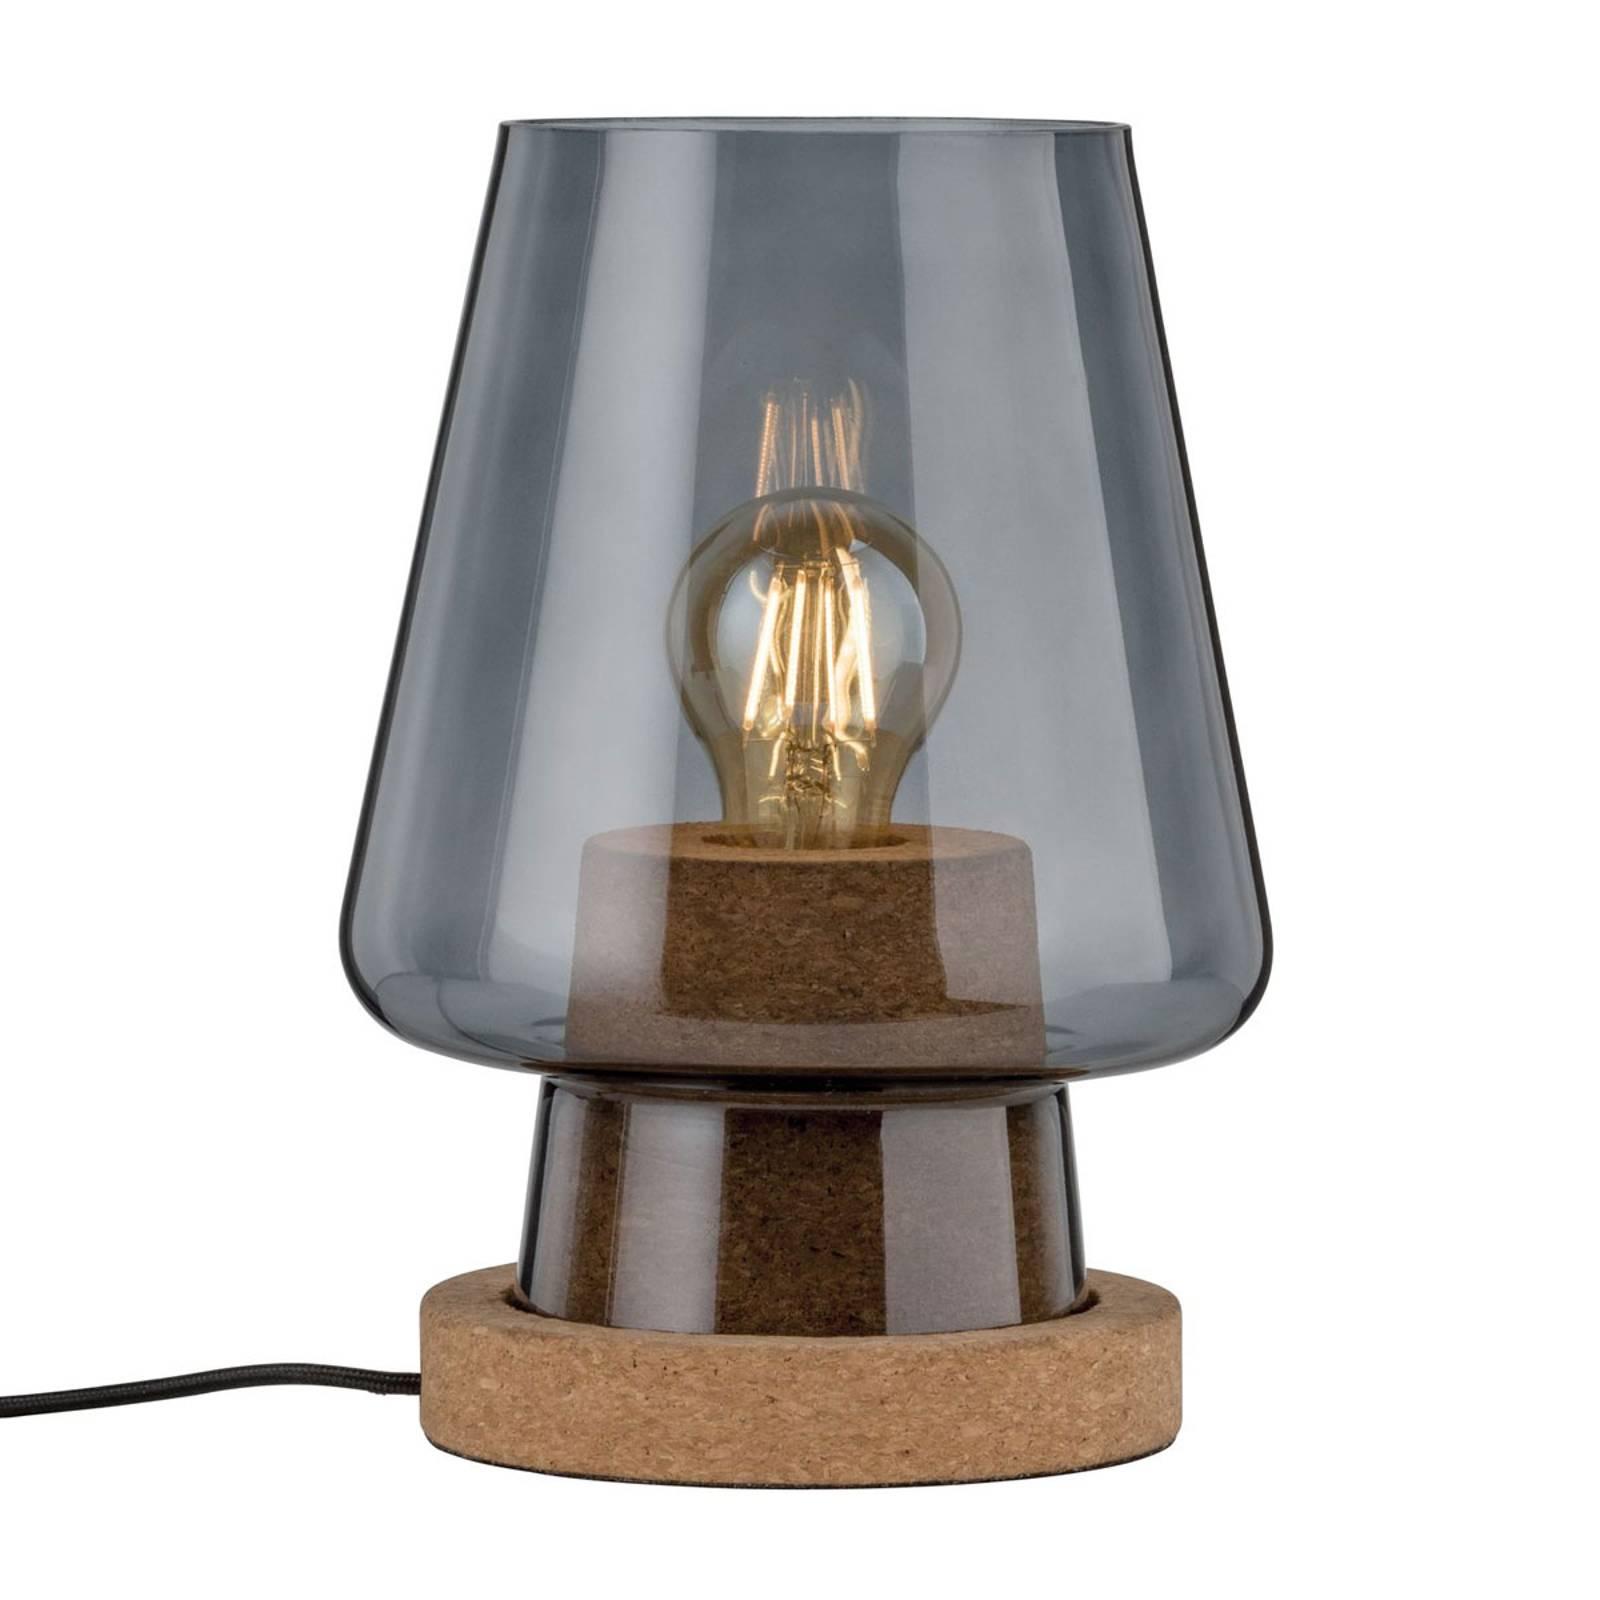 Paulmann Iben lampe à poser en verre